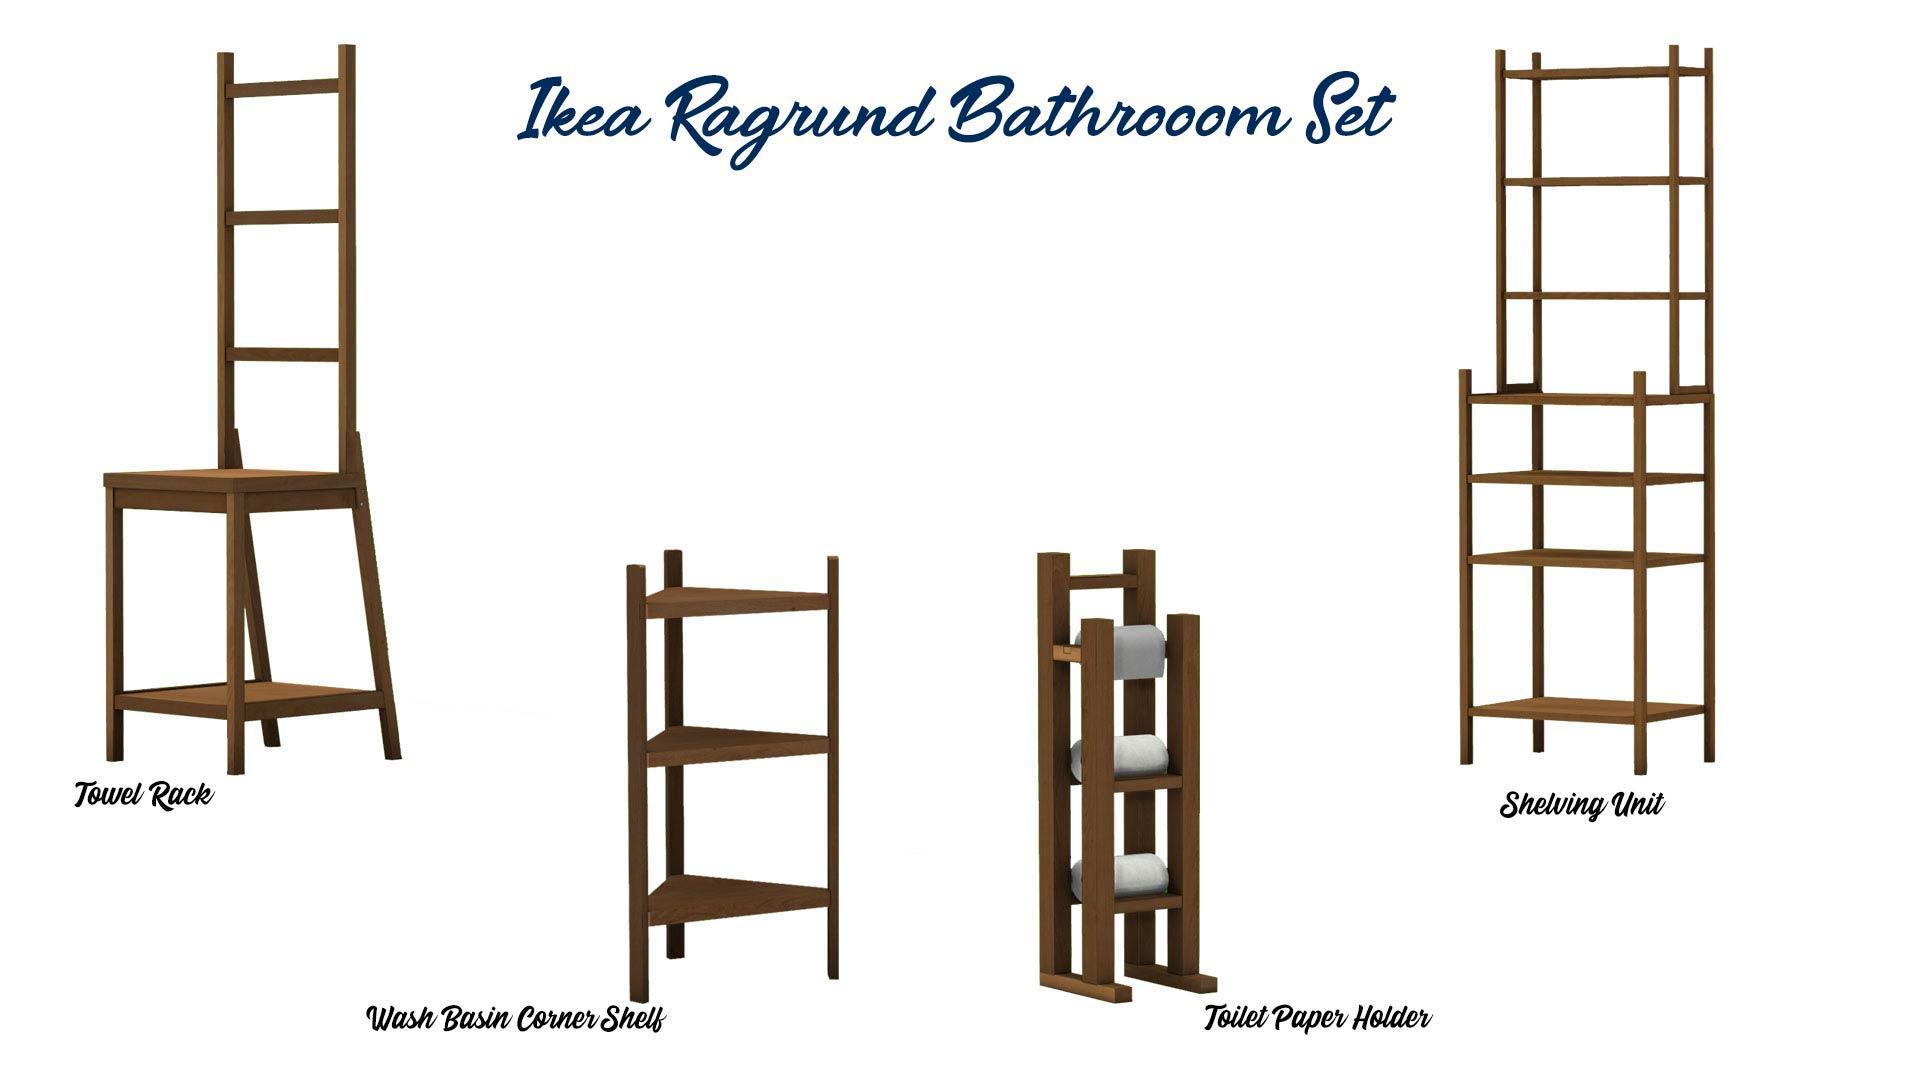 Ikea Ragrund Bathroom Set, high quality sims 4 cc, sunkissedlilacs, free sims 4 furniture, sims 4 custom content,